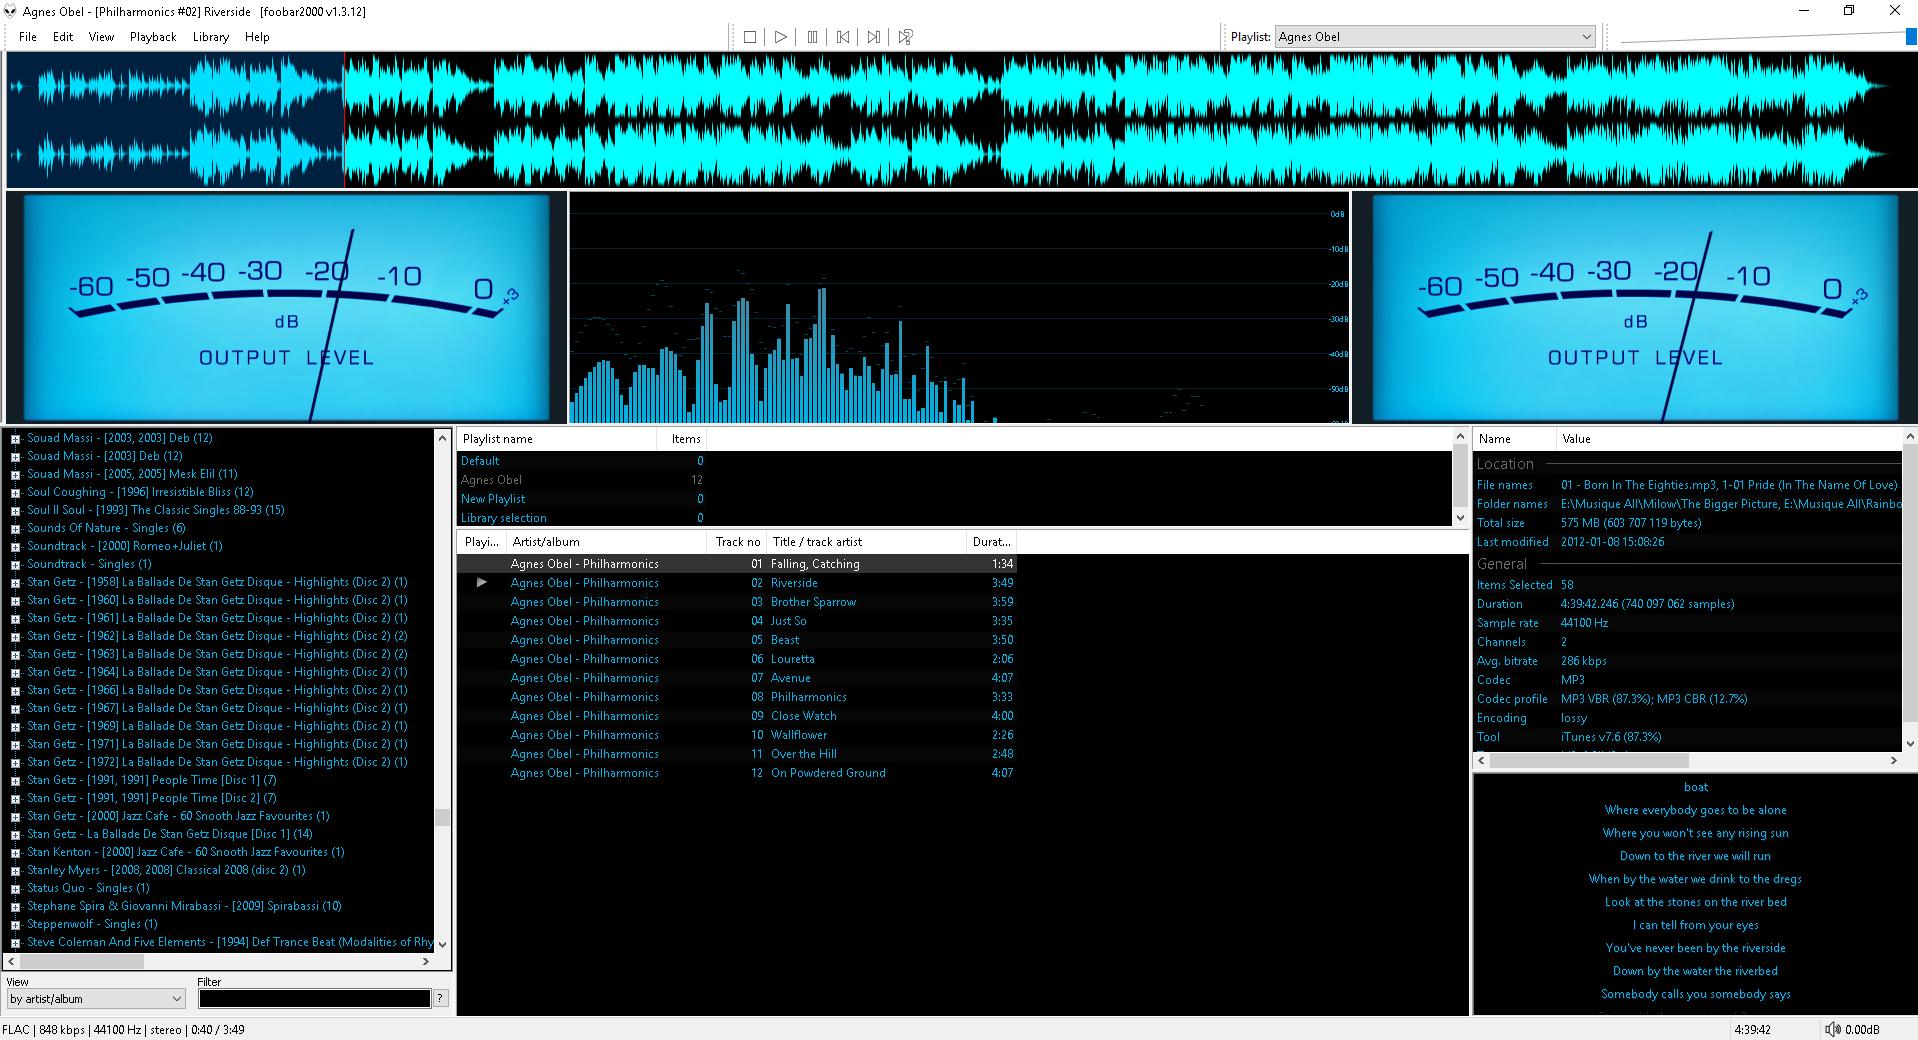 foobar2000 modular freeware audioplayer for Windows